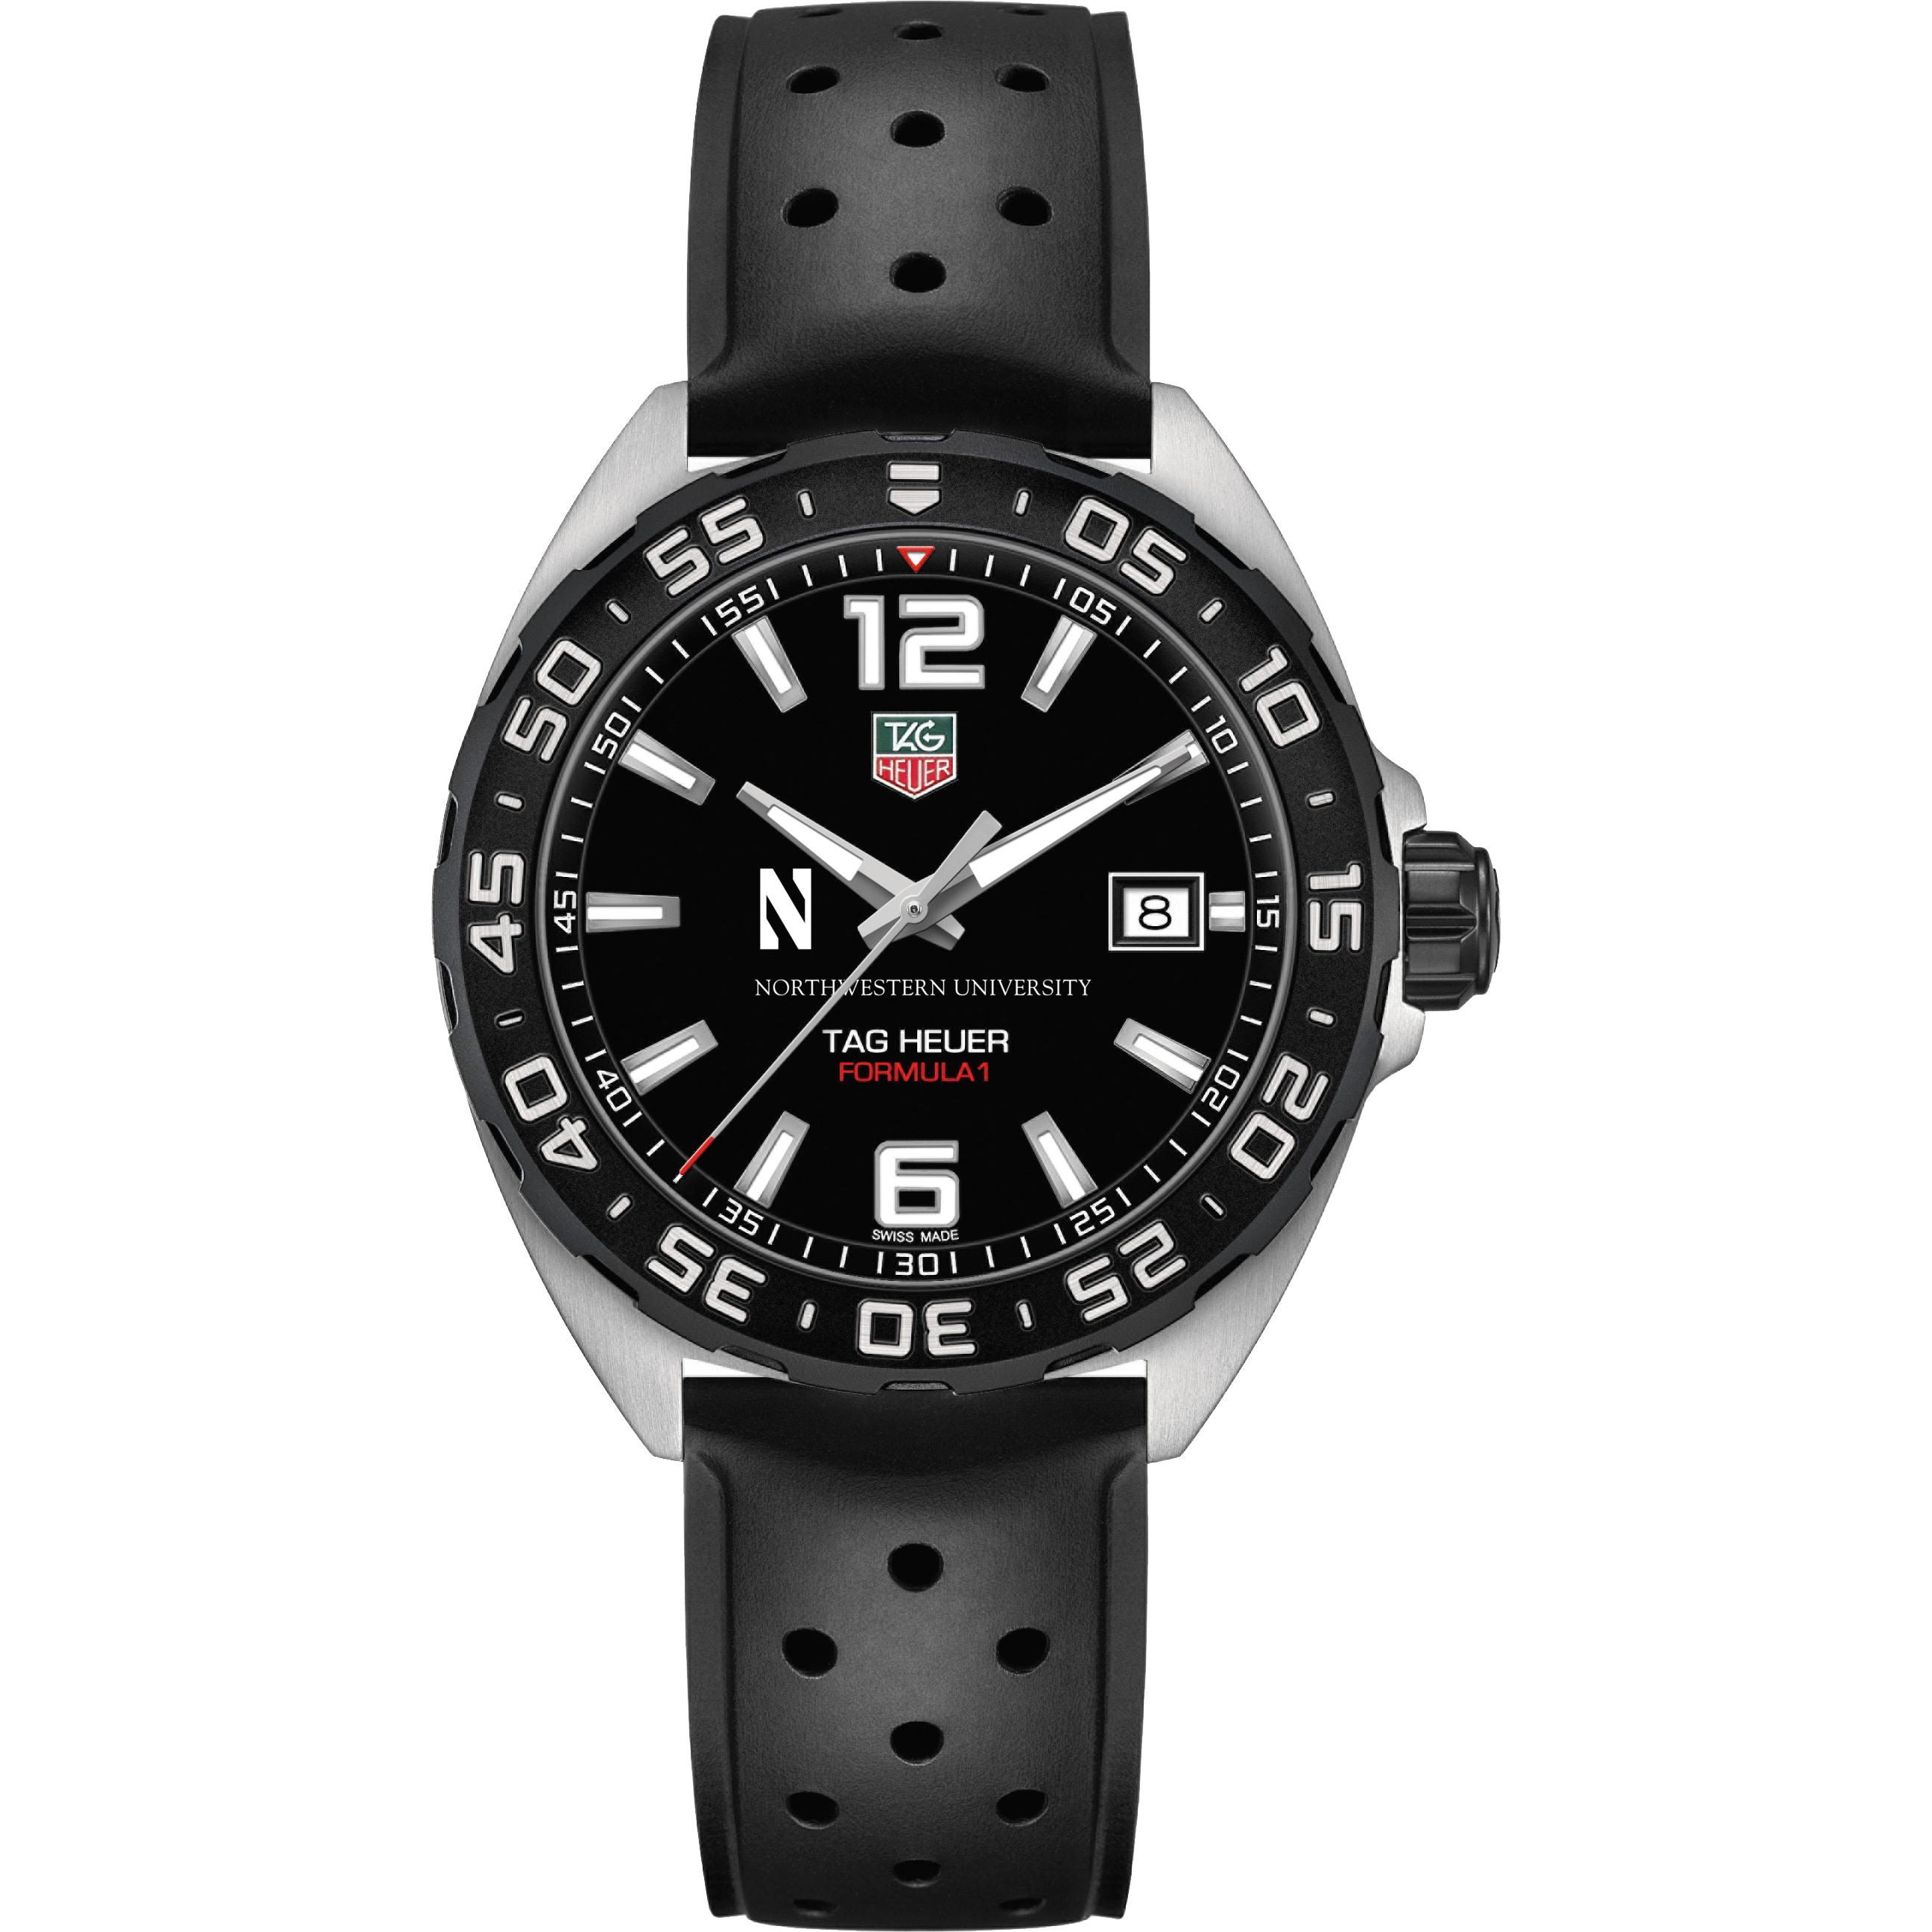 Northwestern Men's TAG Heuer Formula 1 with Black Dial - Image 2